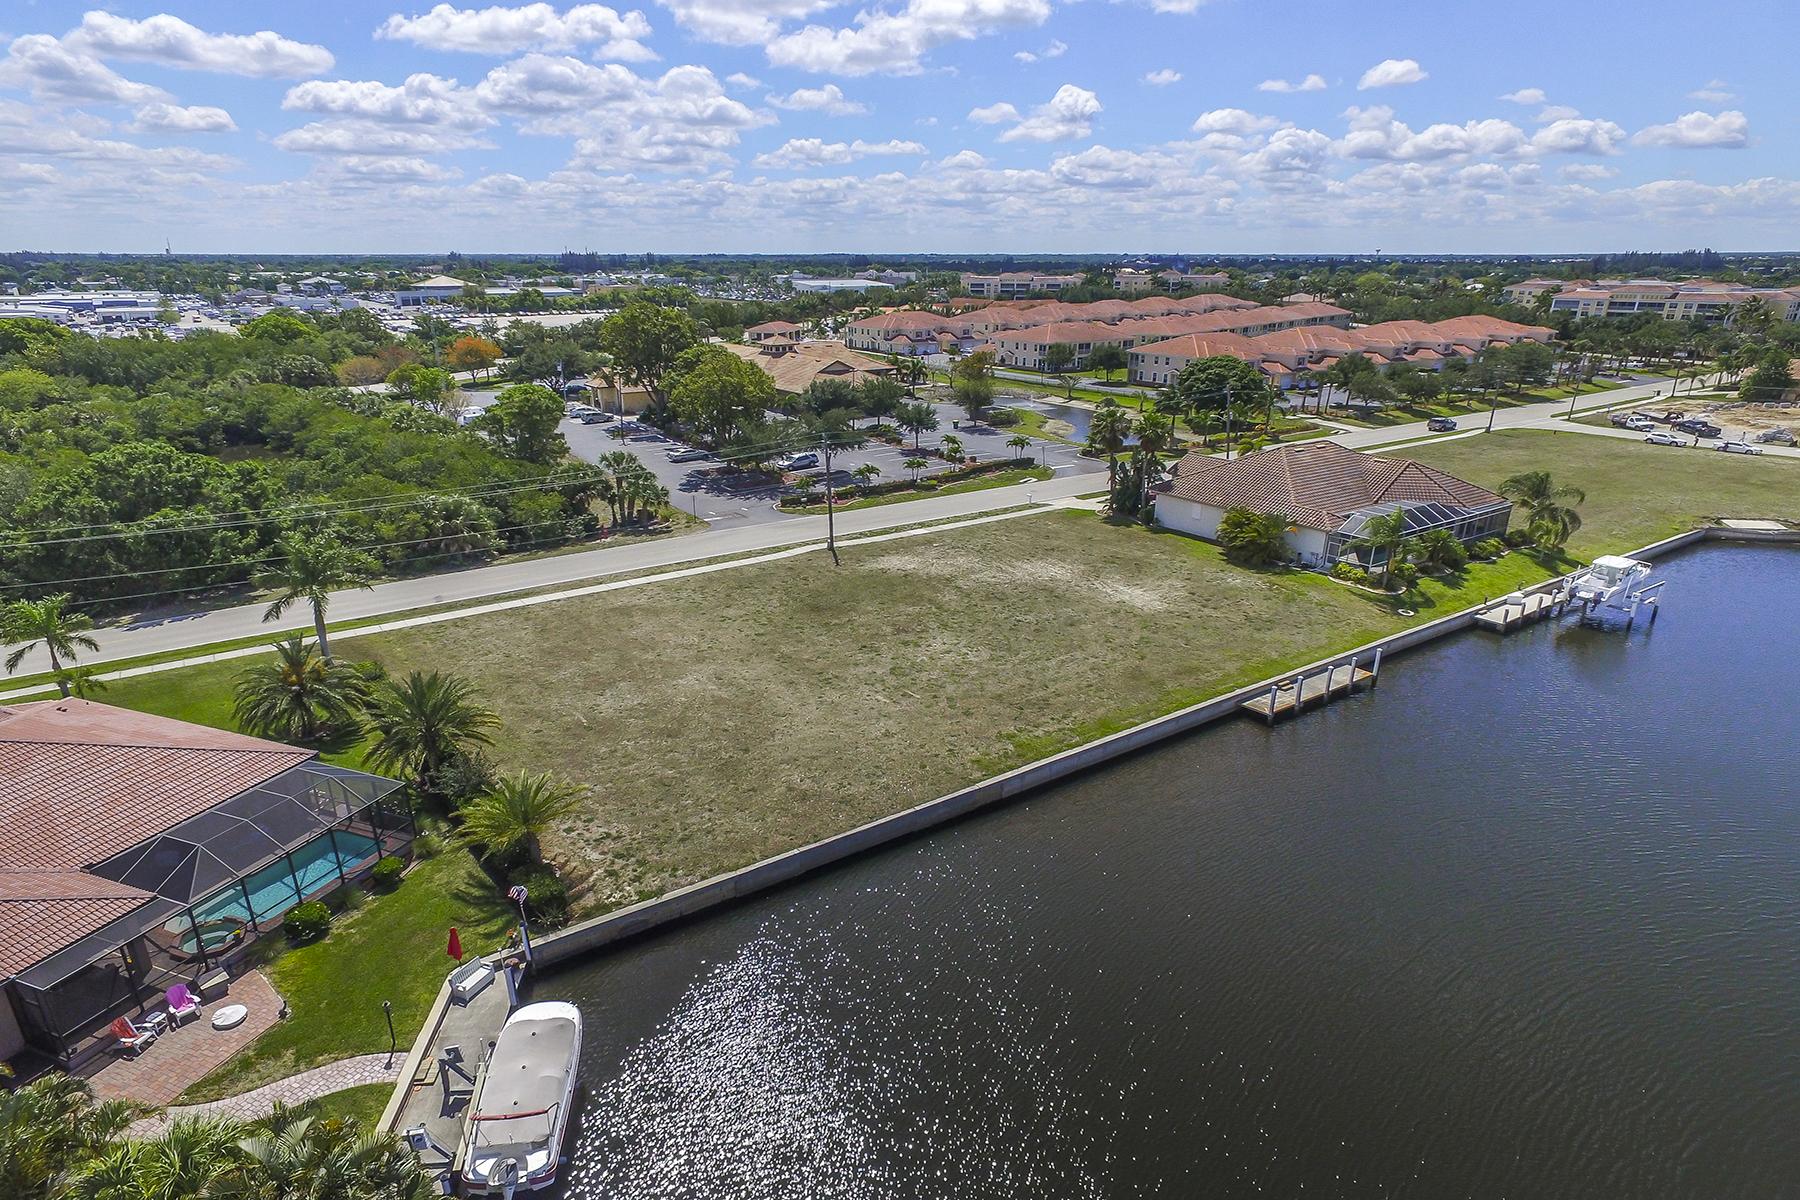 Land for Sale at PUNTA GORDA ISLES 2033 Magdalina Dr Punta Gorda, Florida 33950 United States